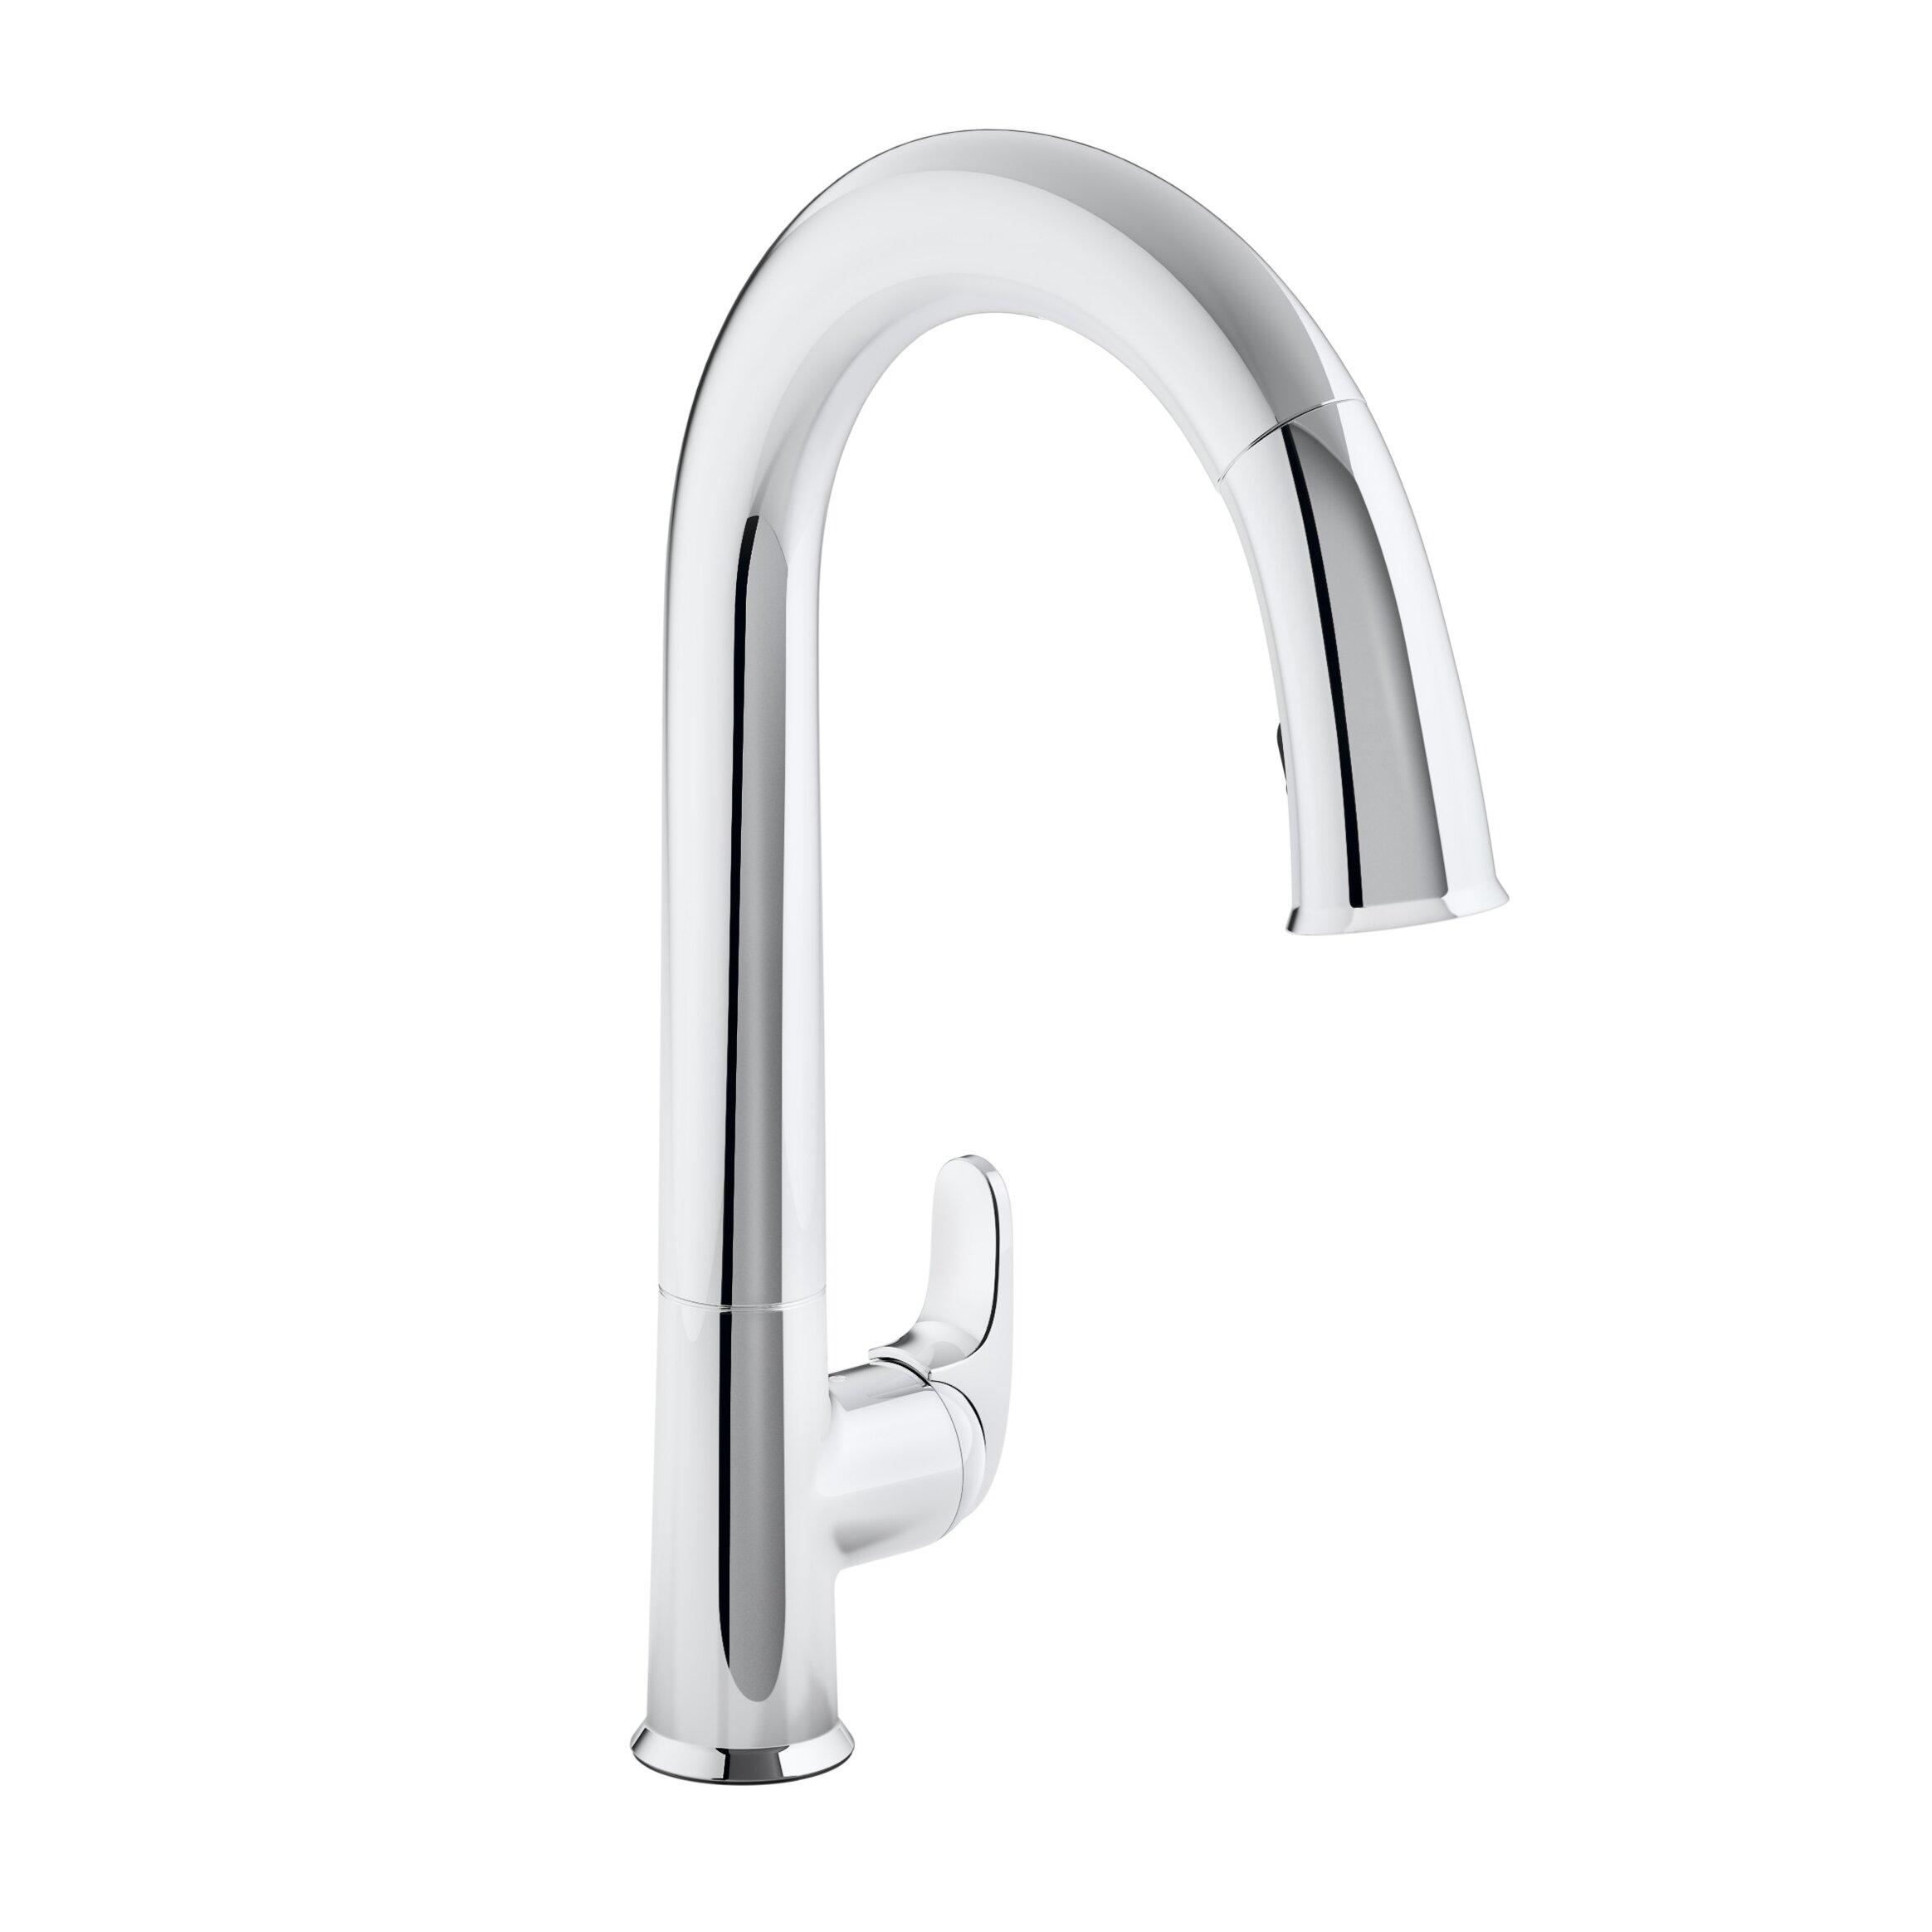 "Kohler Kitchen Faucet Parts Lookup: Kohler Sensate Touchless Kitchen Faucet With 15-1/2"" Pull"